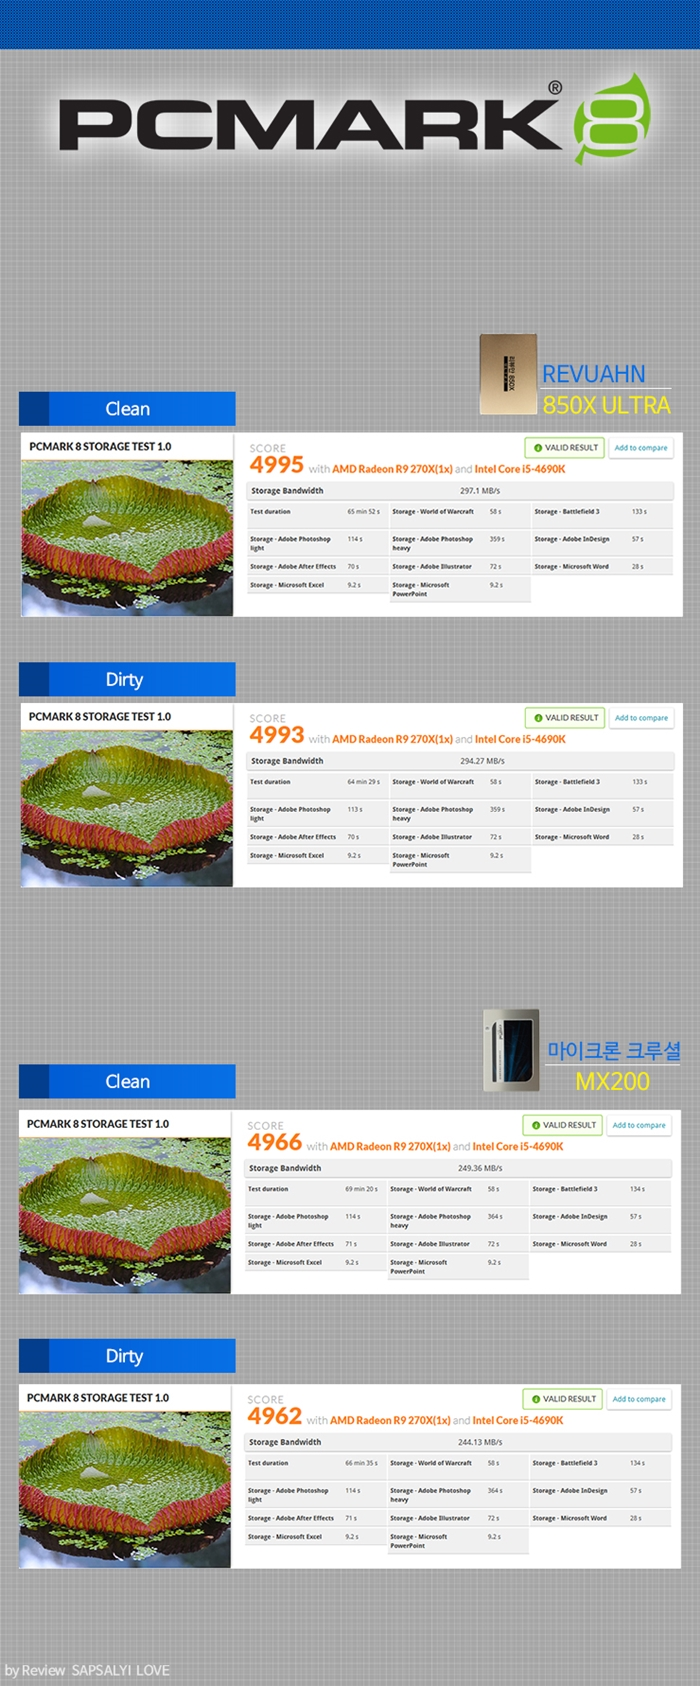 ����� 850X ULTRA (��Ʈ��) ����3 SLC ���� �÷��� SSD ��õ.jpg